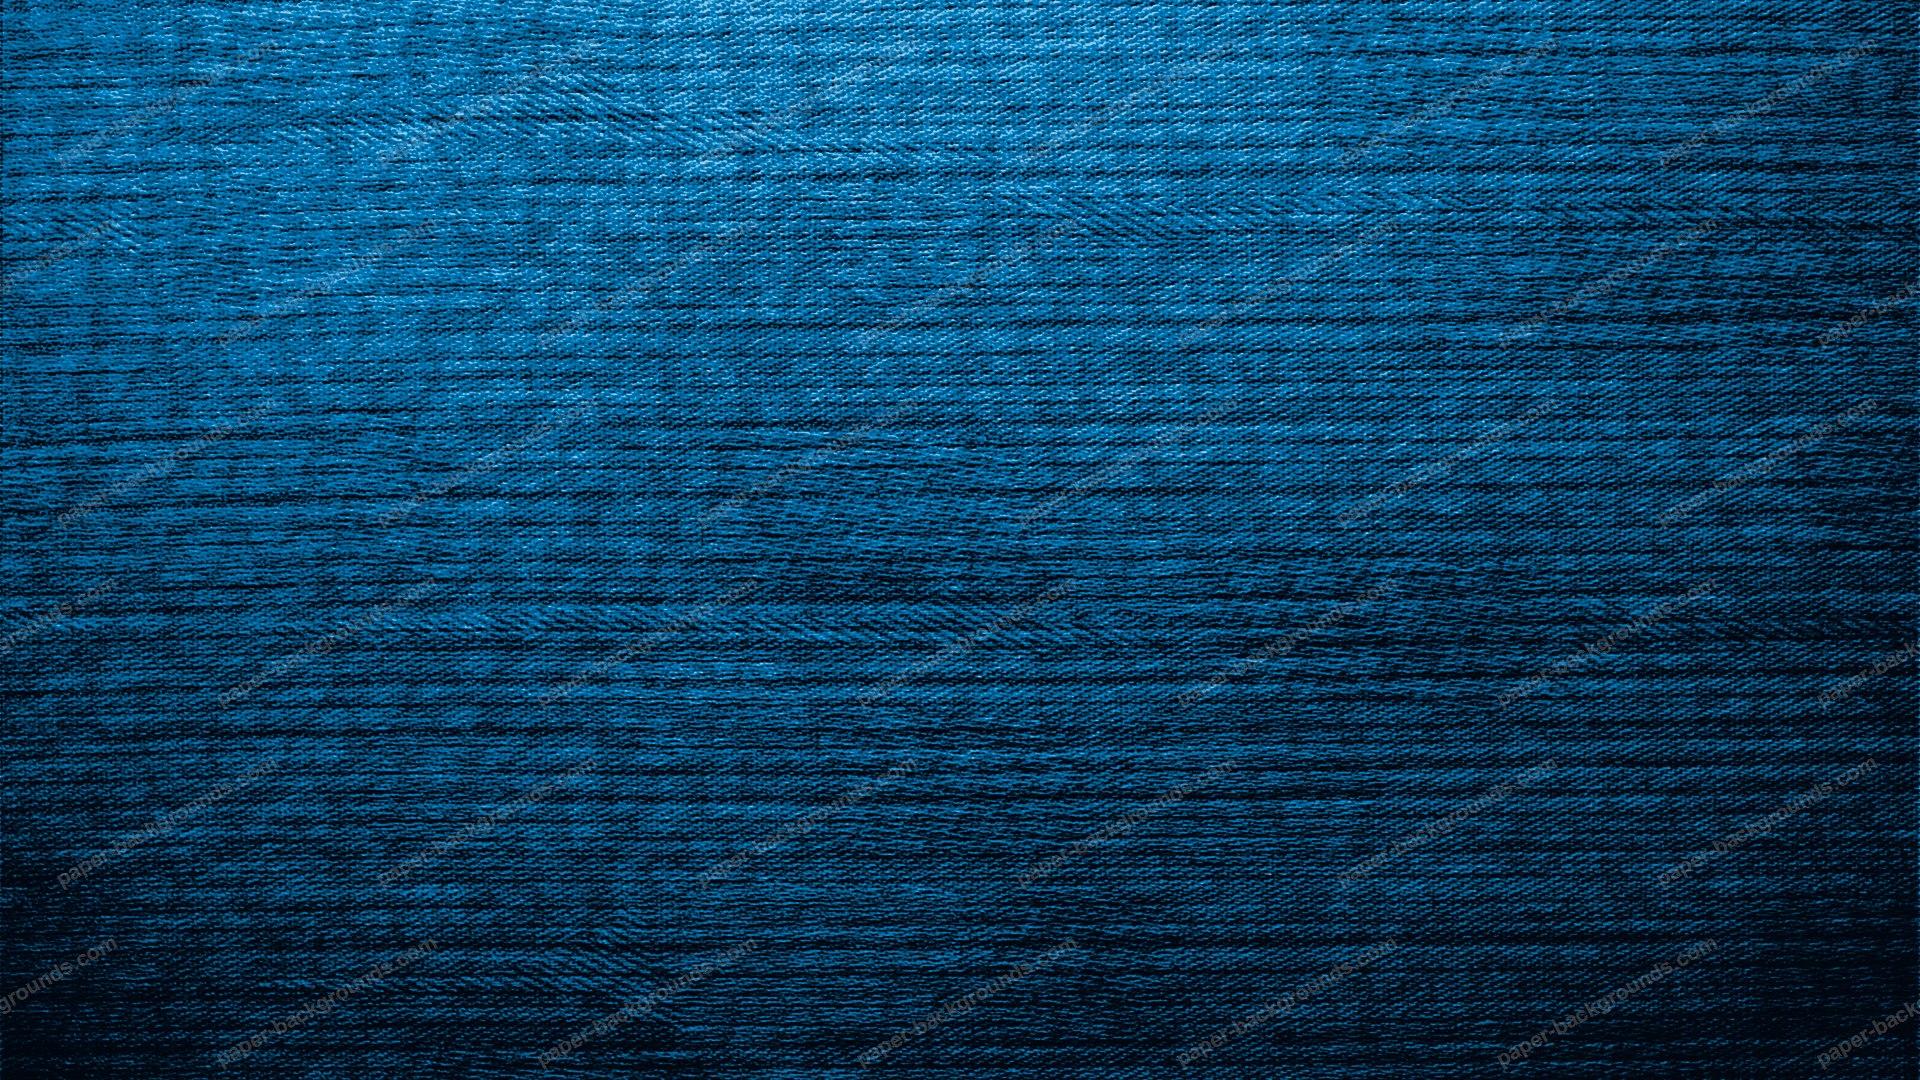 Hd wallpaper 1080p blue wallpapersafari - White grunge background 1920x1080 ...